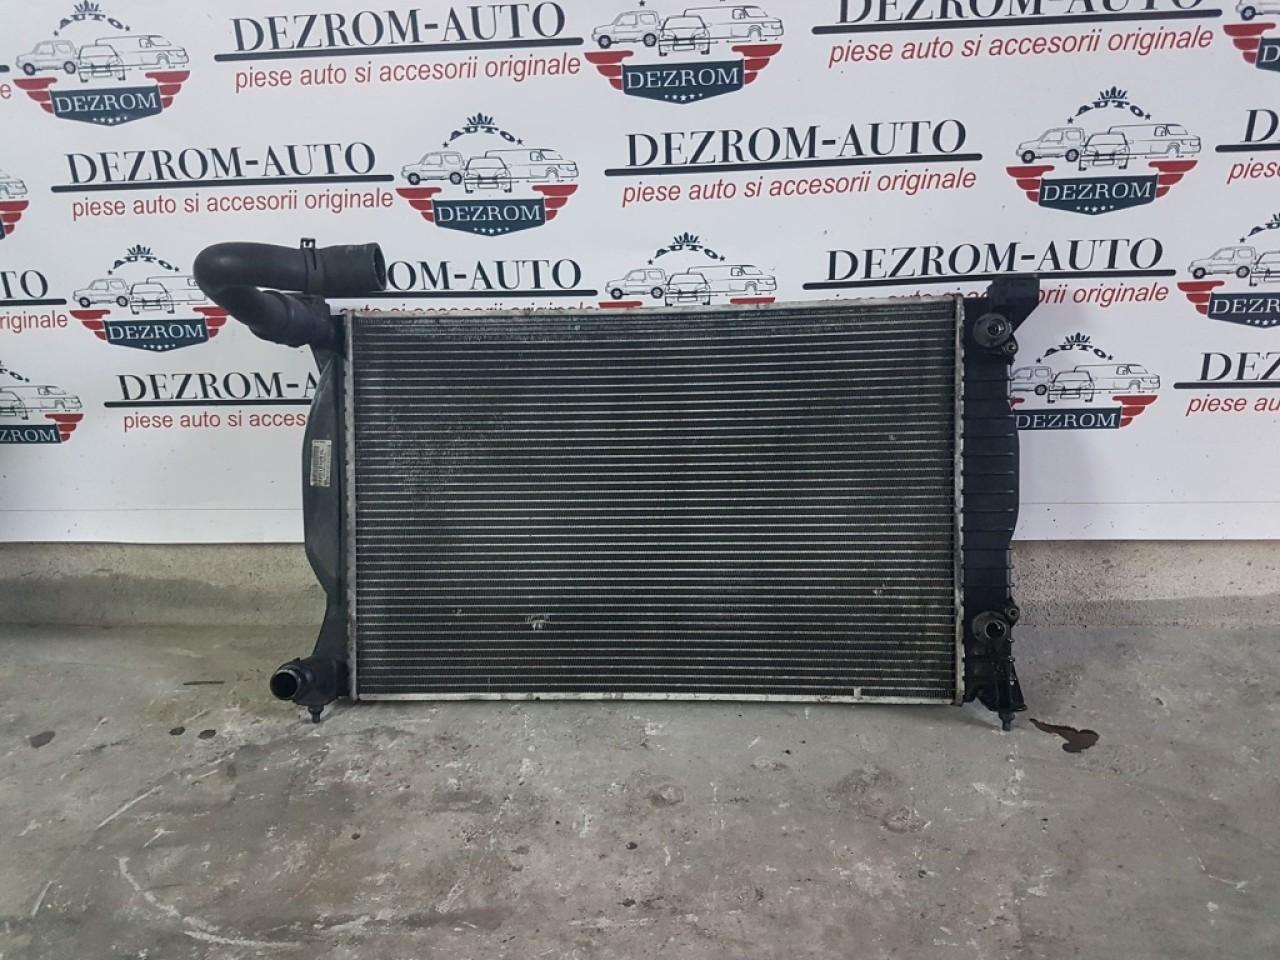 Radiator apa 8e0121251L pentru cutie automata audi a4 b7 1.8t bfb 163 cai